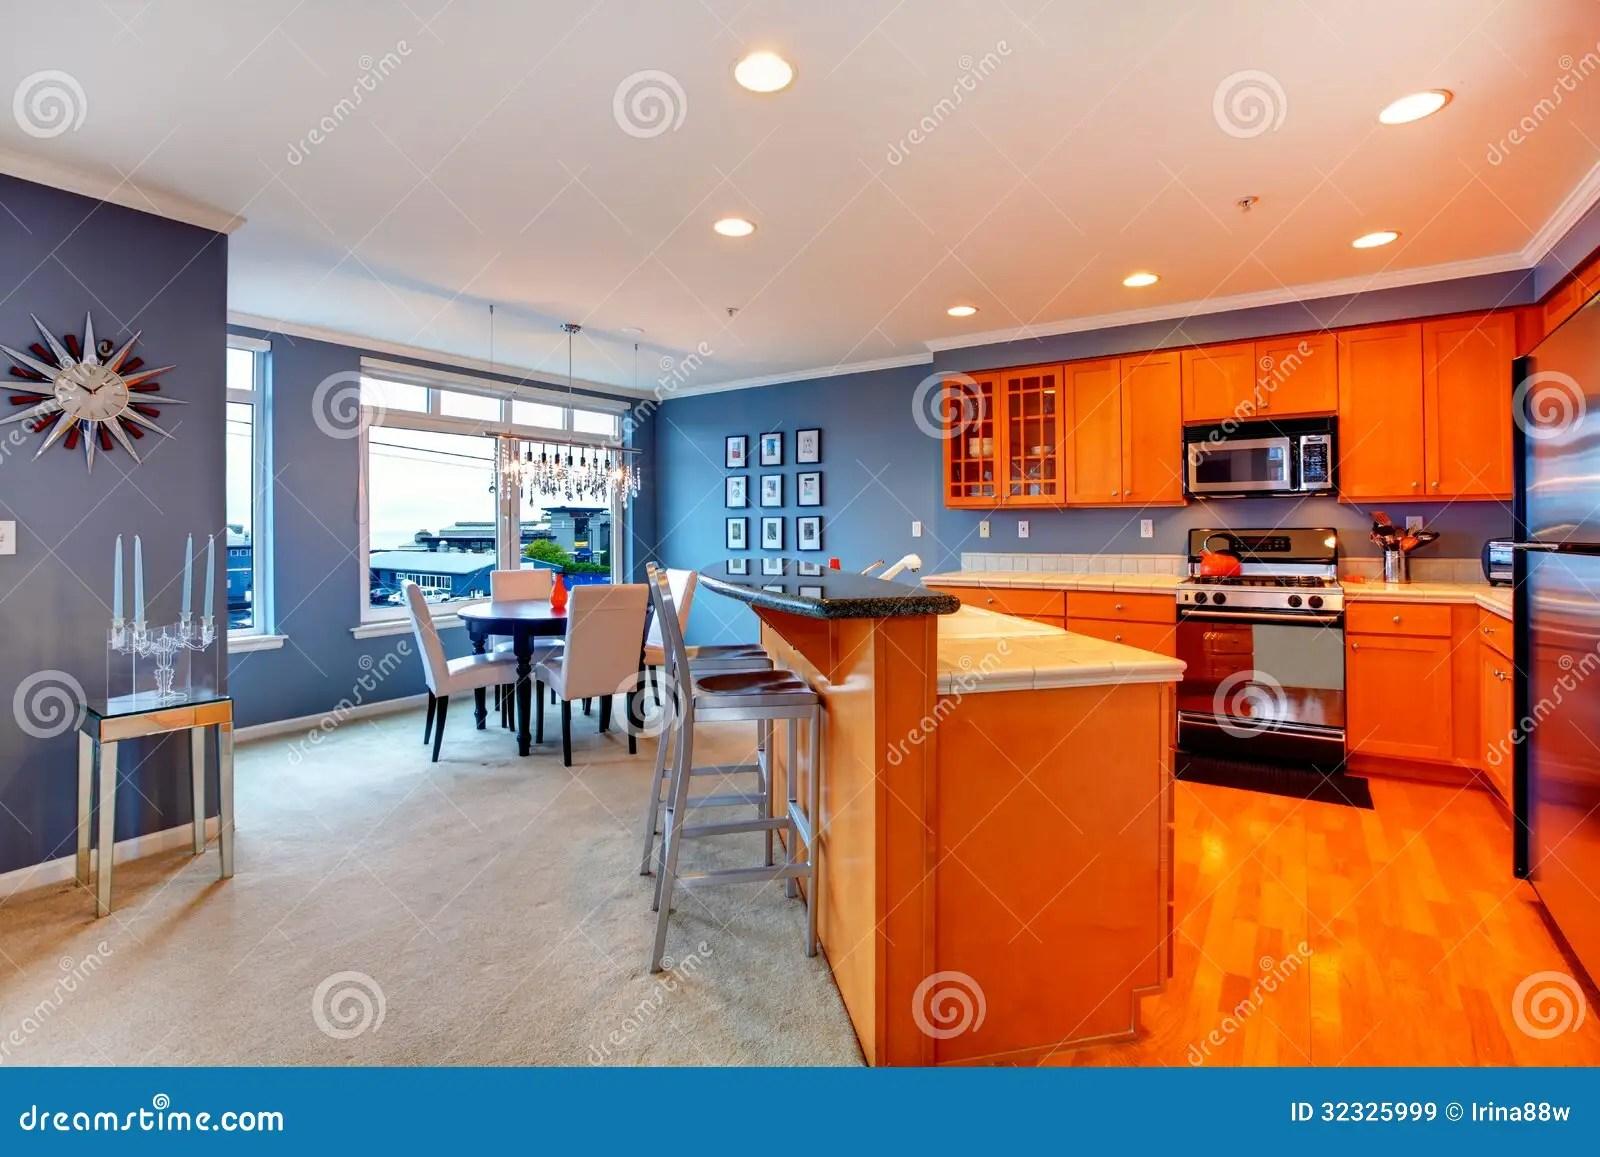 orange kitchen rug camo appliances 有蓝色餐厅的城市公寓橙色木厨房 库存图片 图片包括有蓝色 系列 米黄地毯